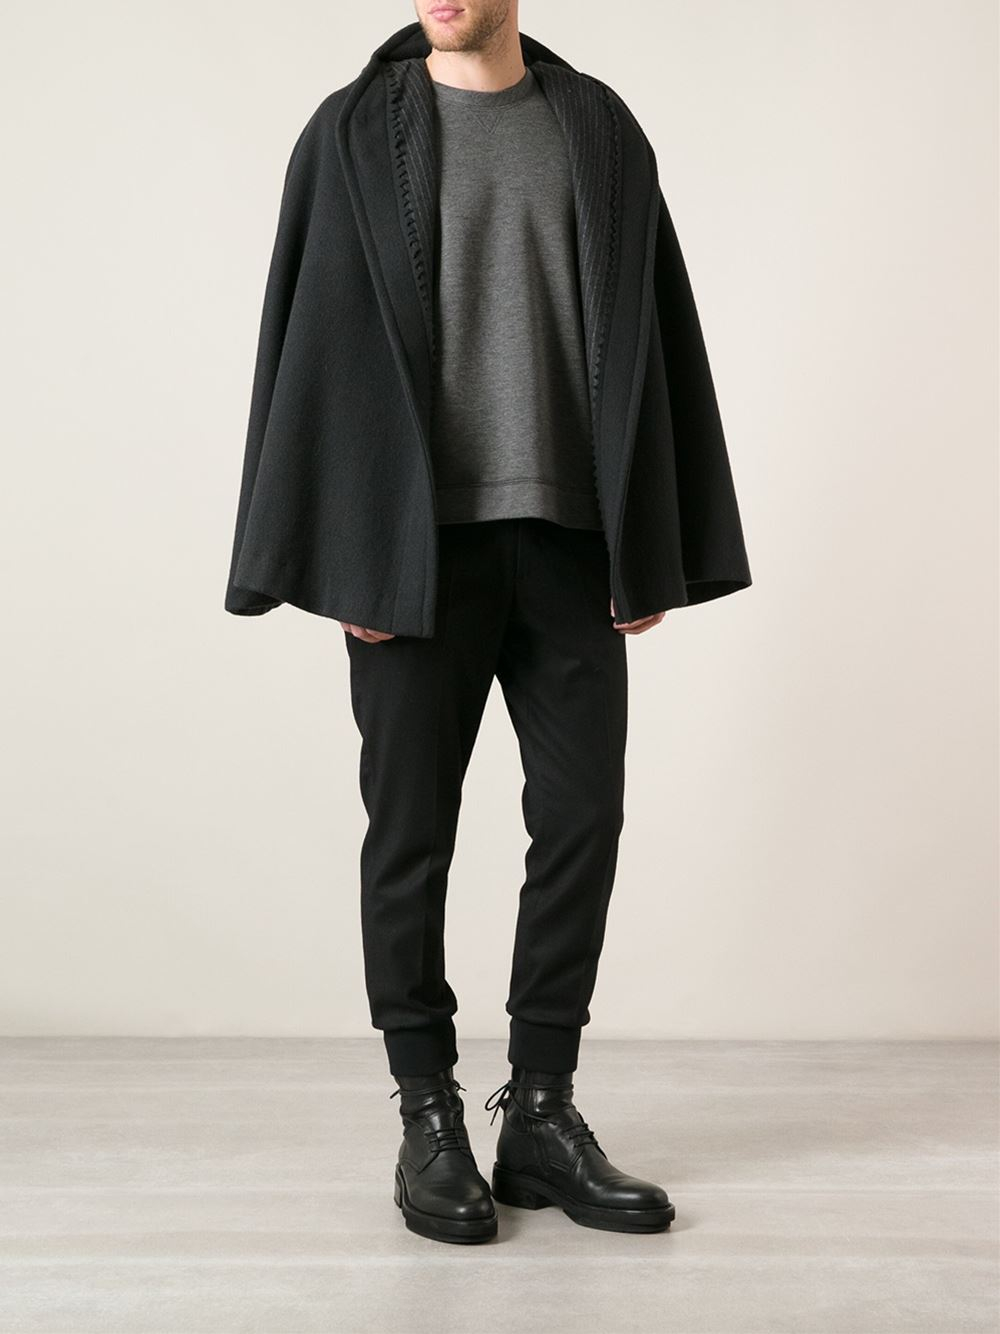 Dolce & Gabbana dark grey wool blend cape coat with a hood